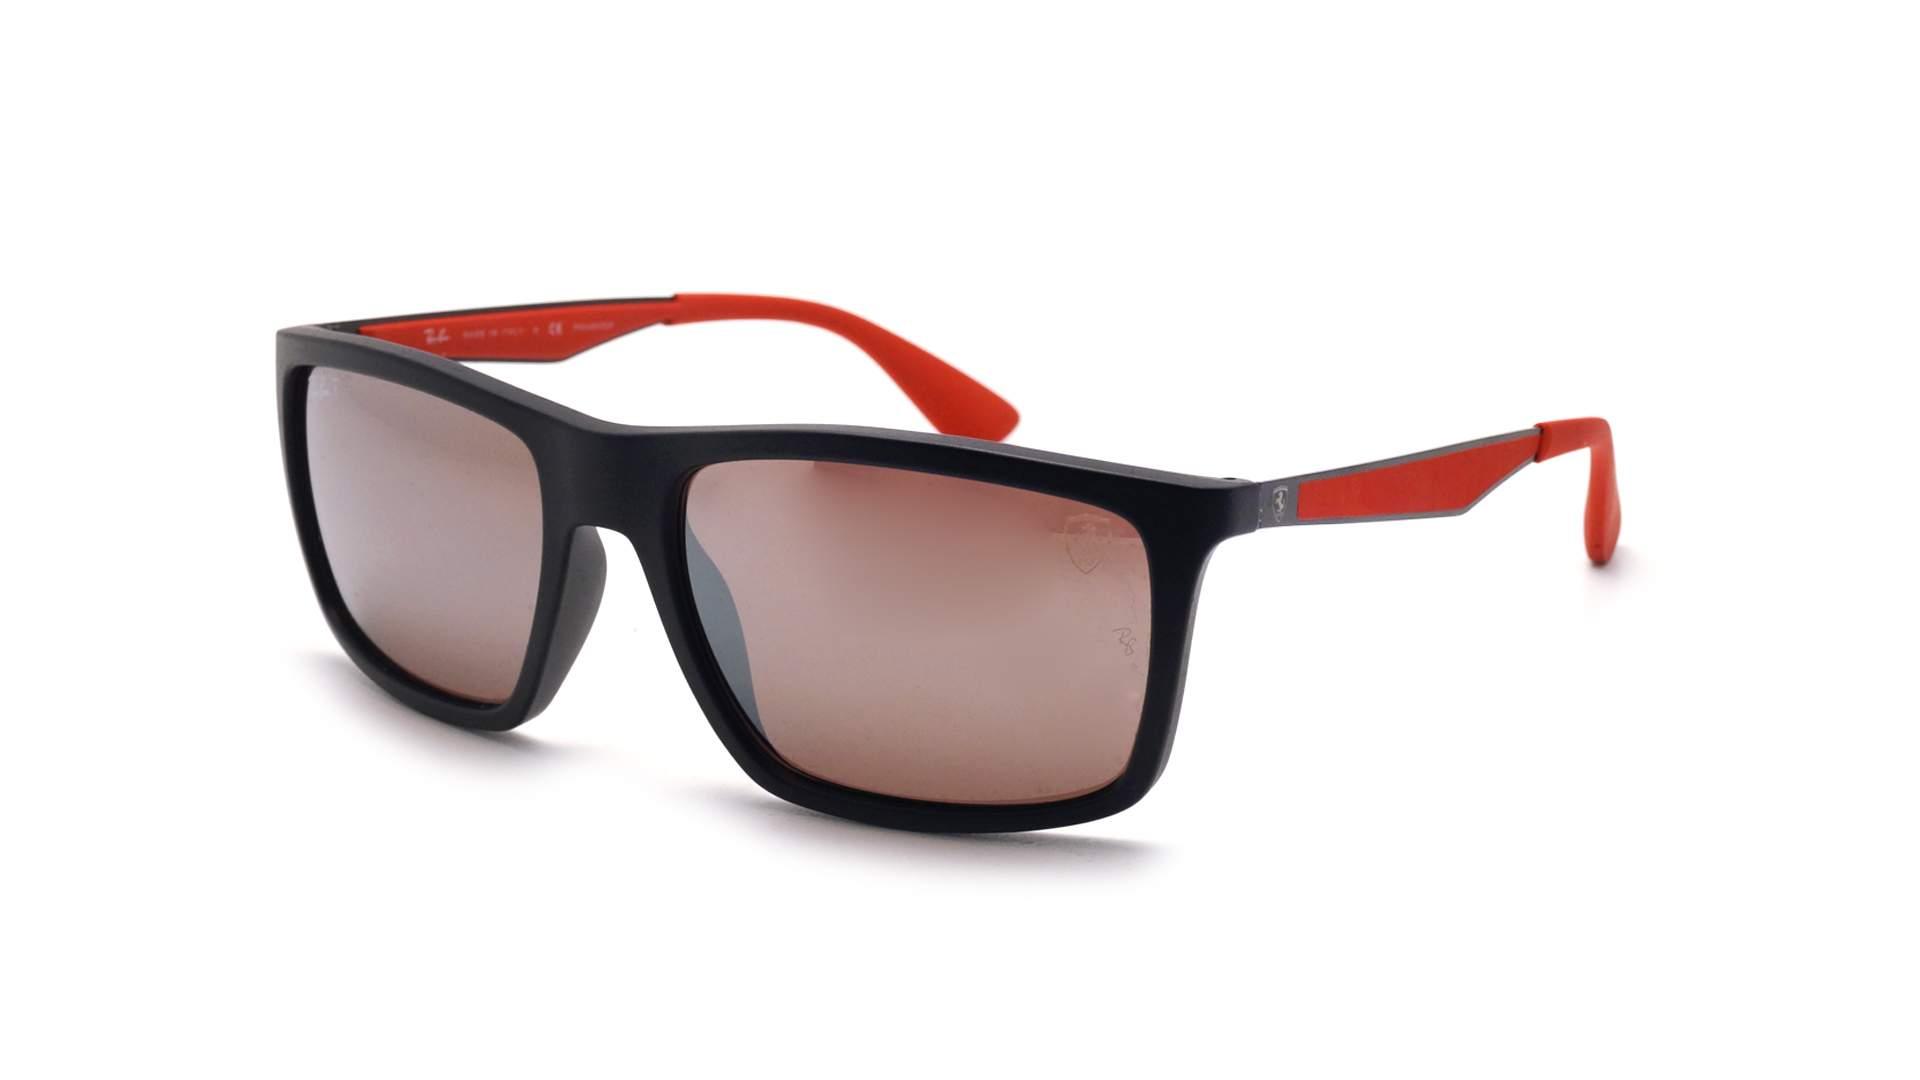 349d43df21 Sunglasses Ray-Ban Scuderia Ferrari RB4228M F602 H2 58-18 Black Matte Large  Polarized Mirror